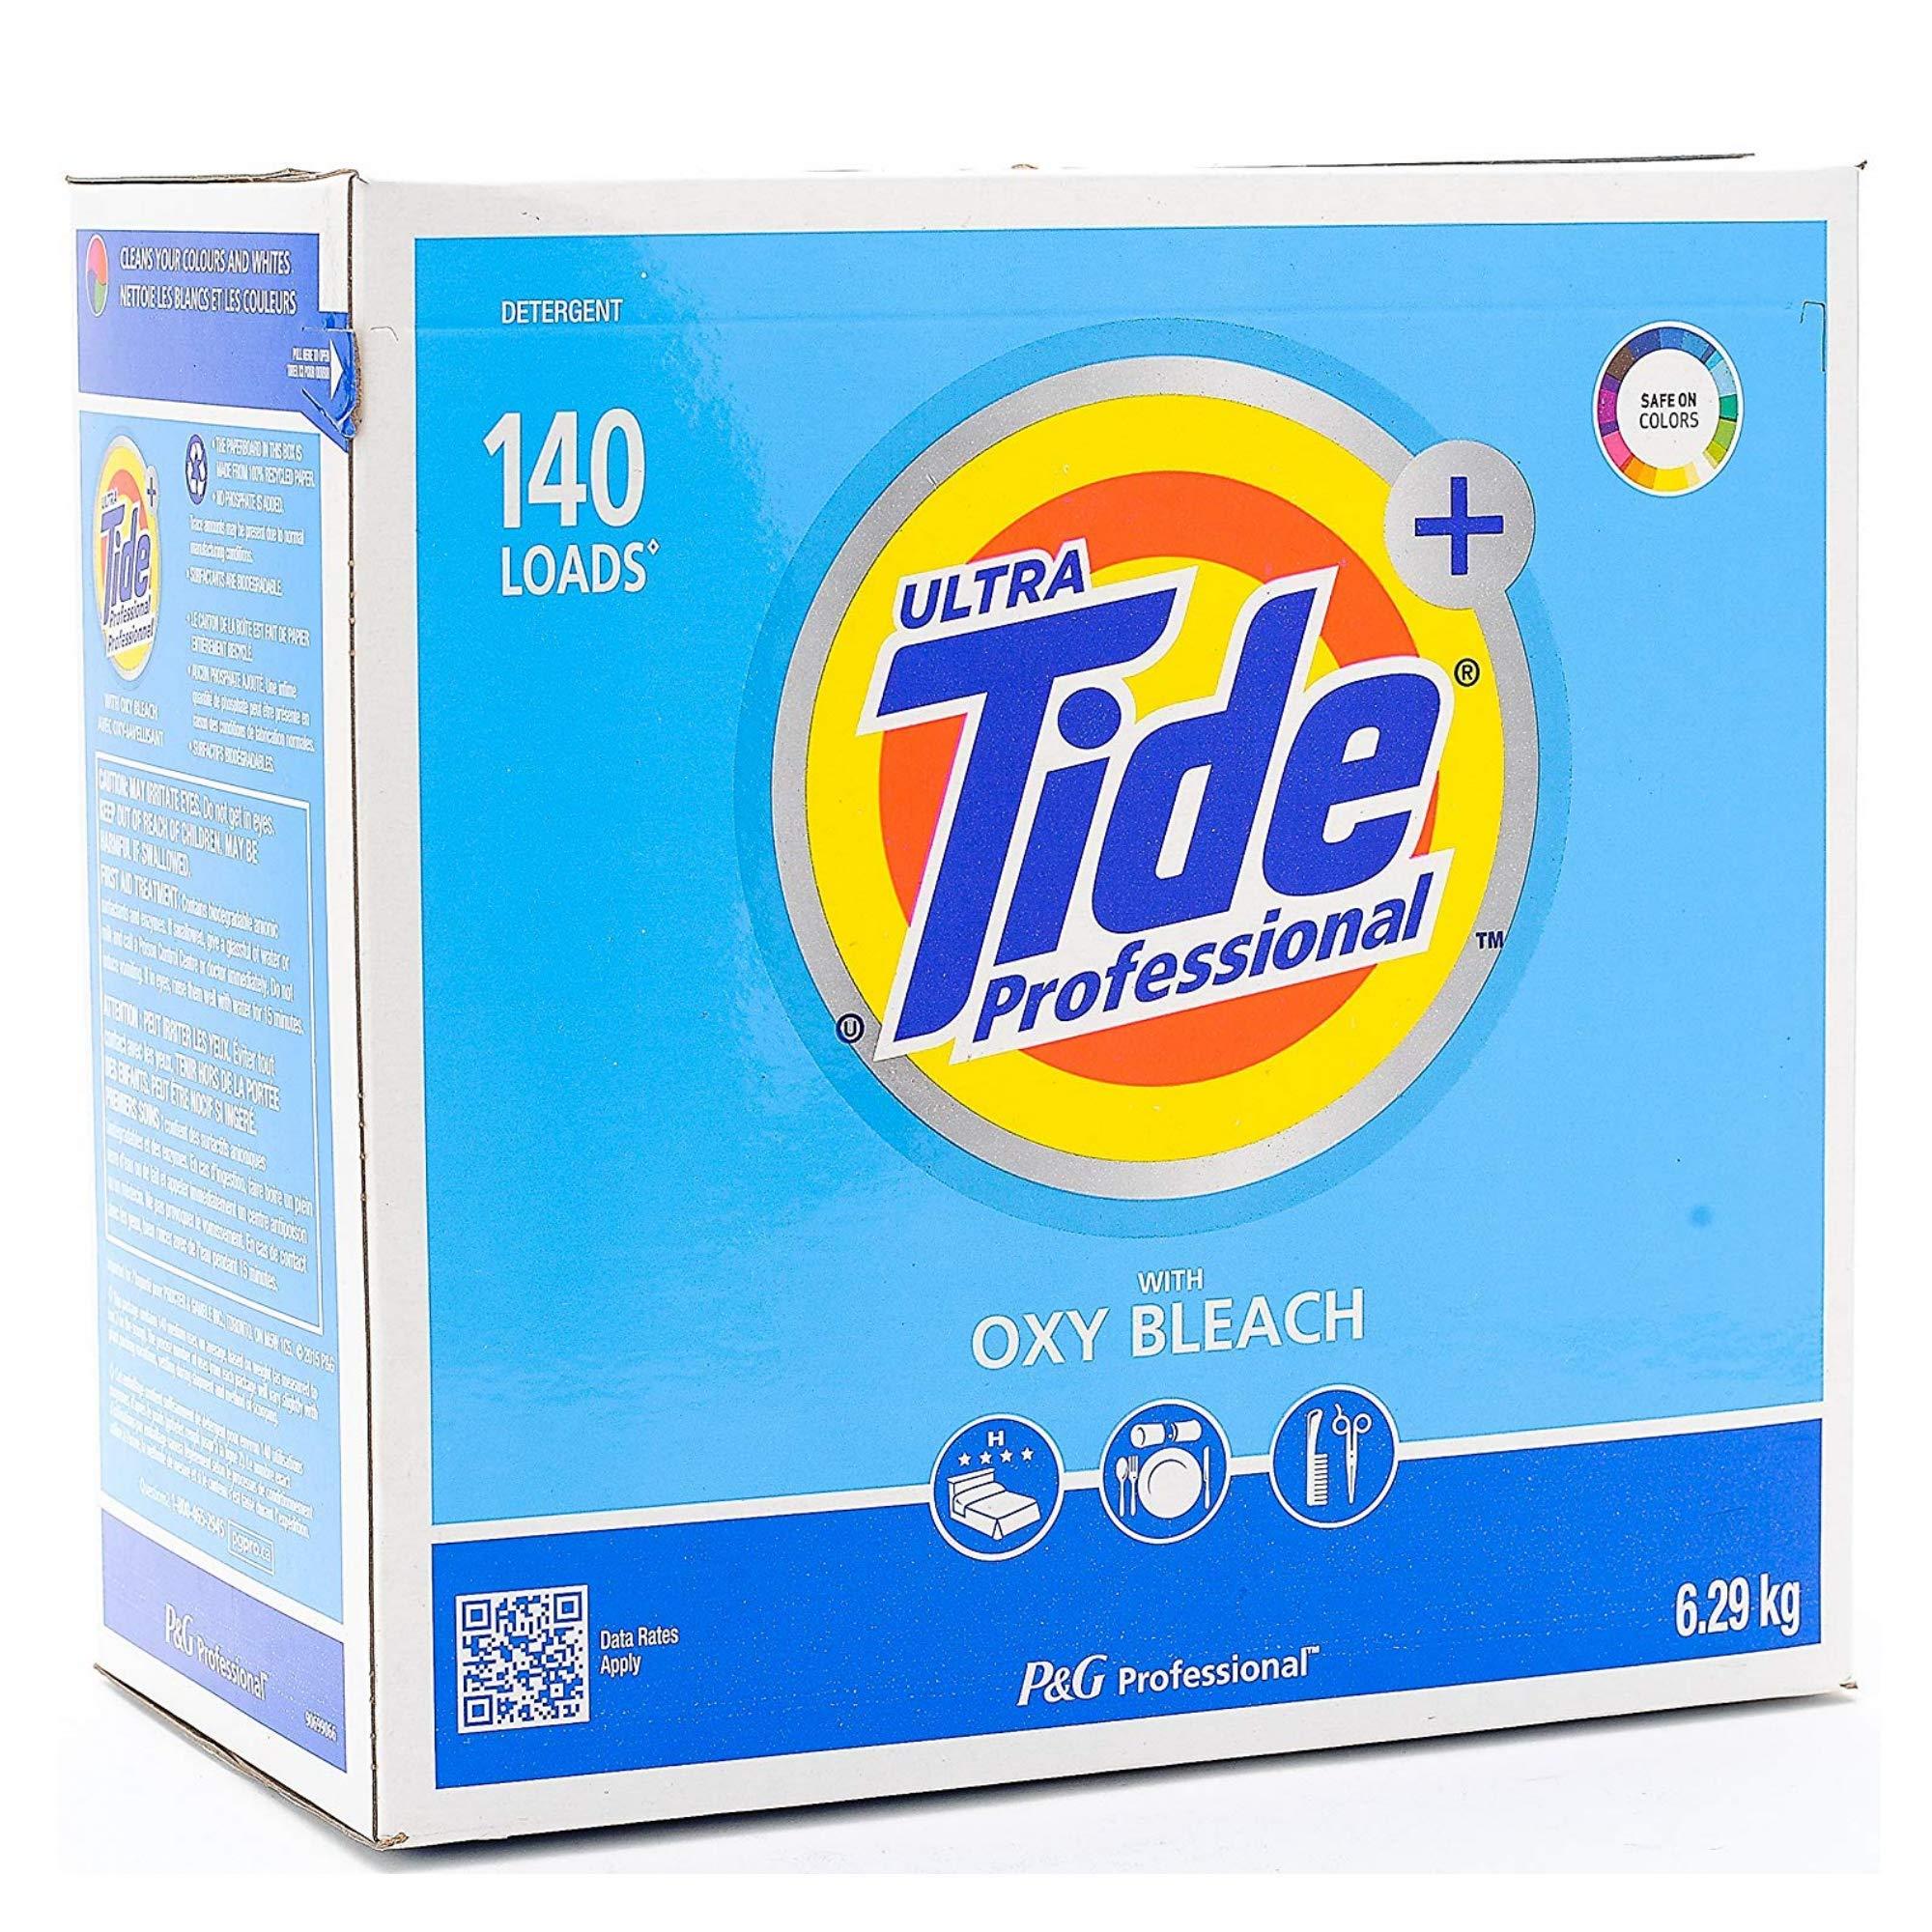 Tide Ultra Tide Professional with OXY Bleach, Powder Detergent, 140 Loads, 15.5 Lbs / 6.29 Kg